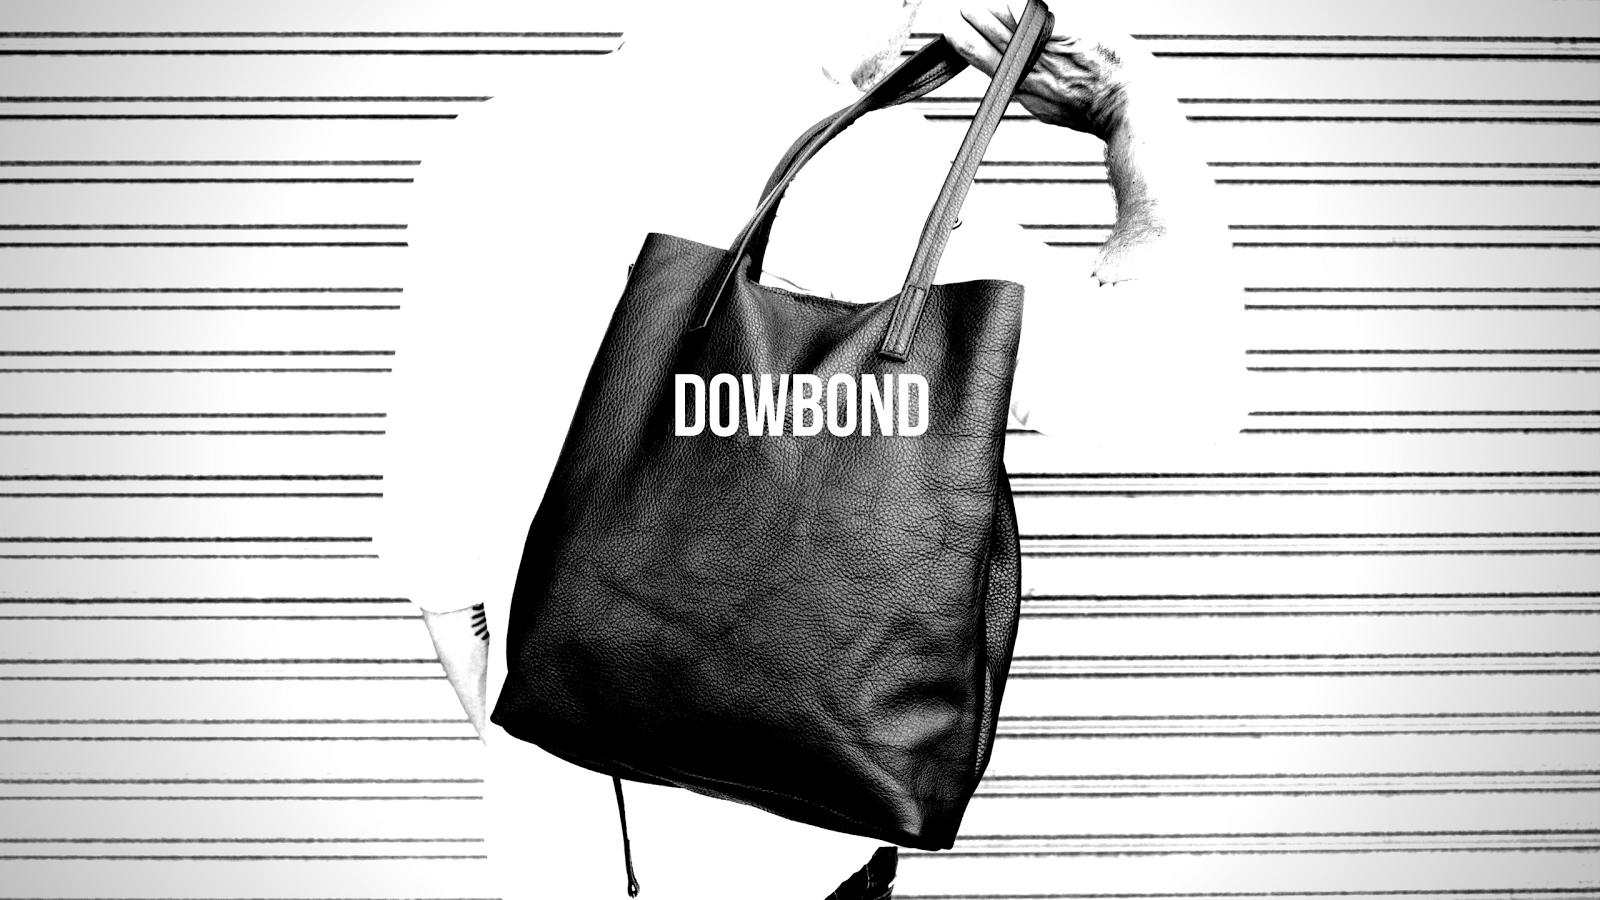 DOWBOND